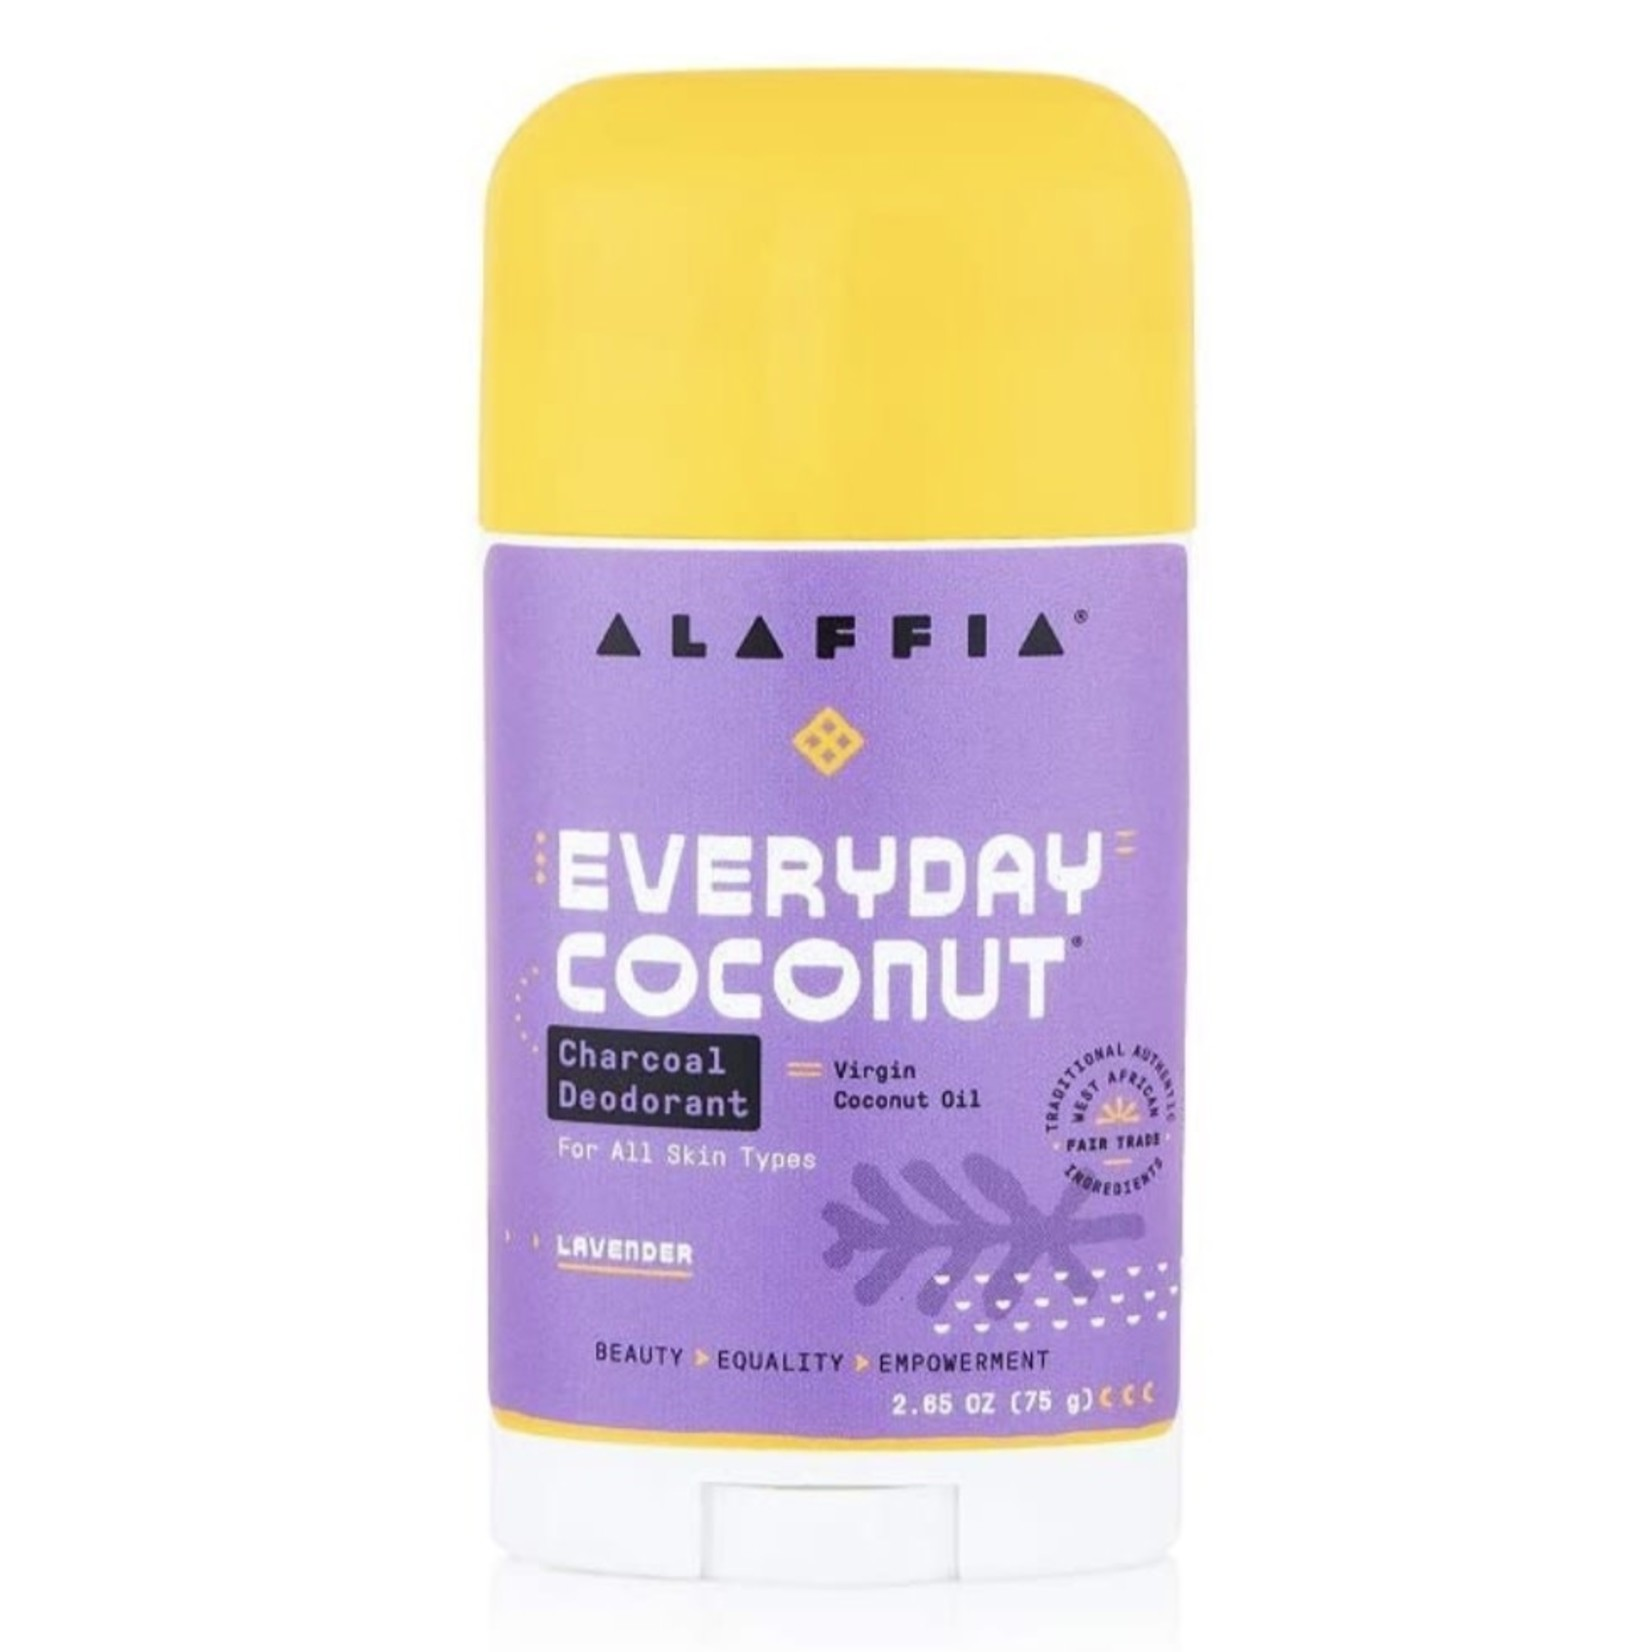 Alaffia Alaffia Coconut Charcoal Lavender Deodorant